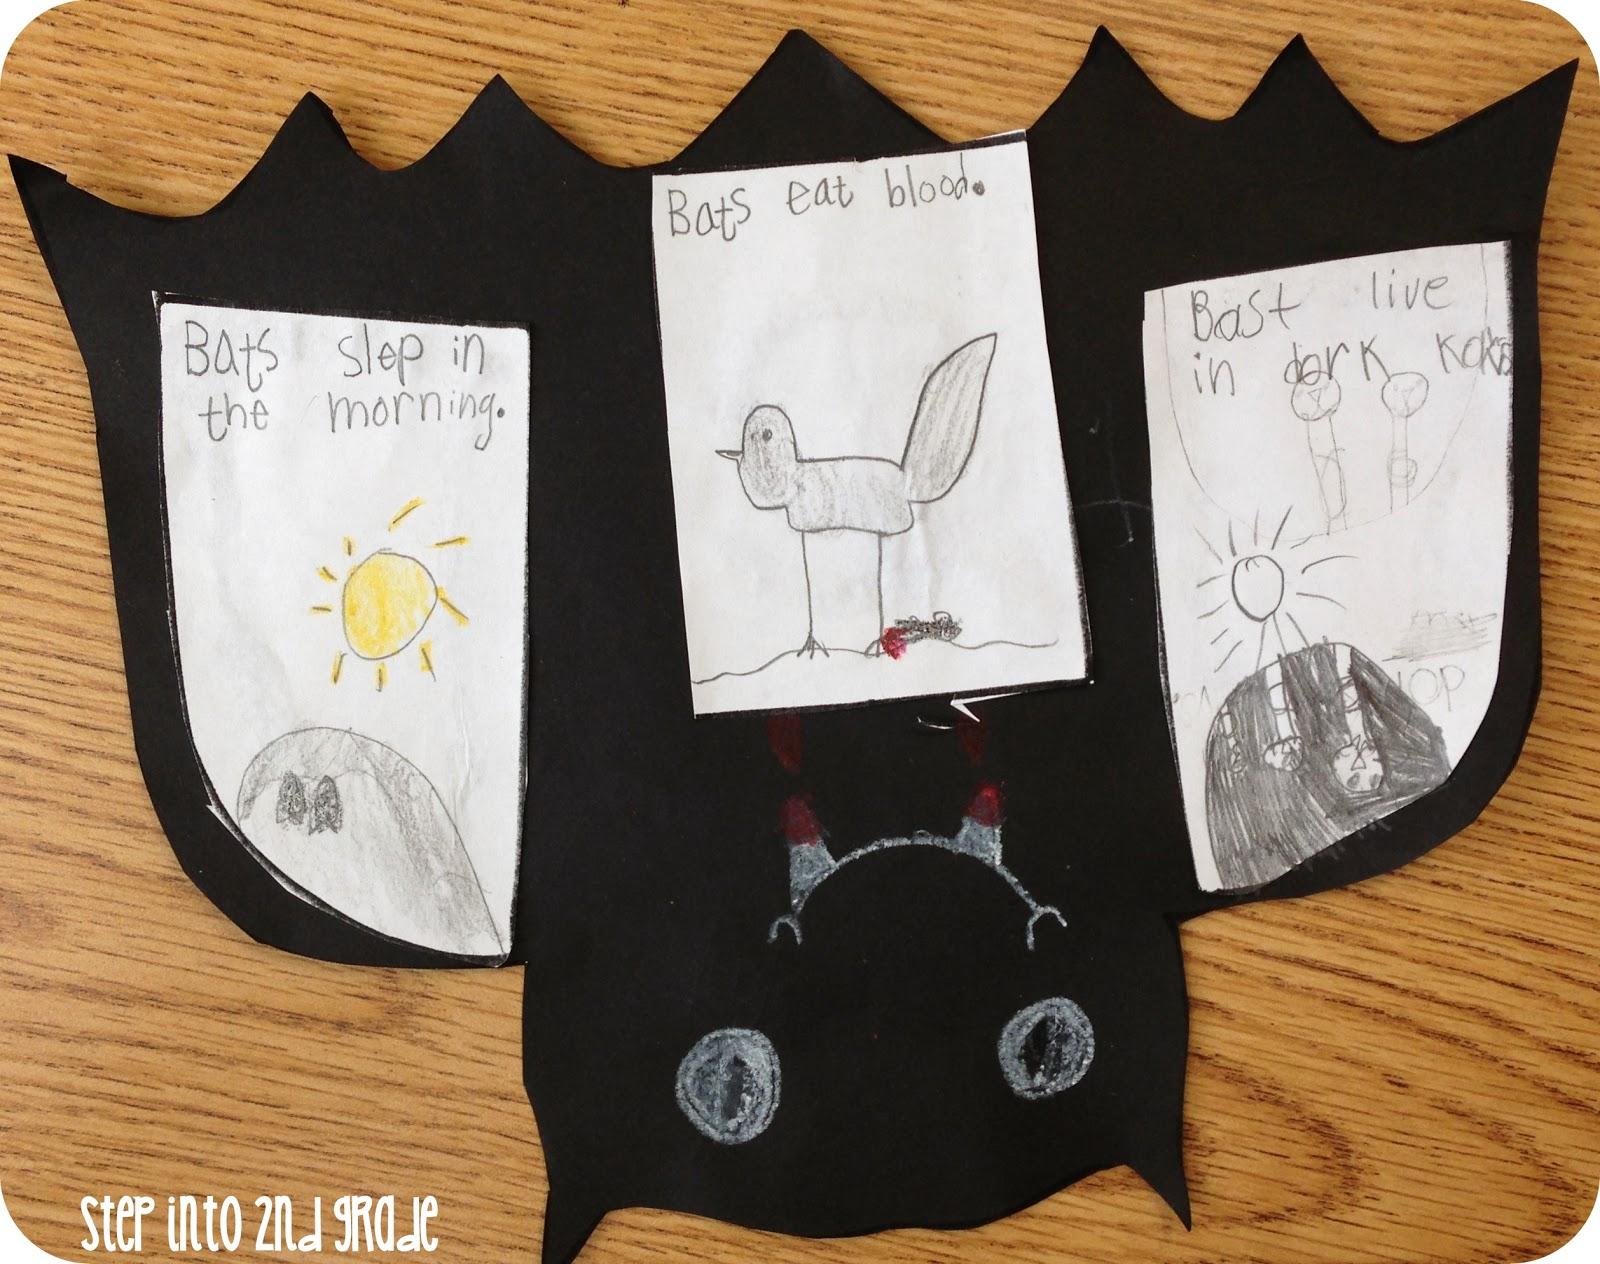 Stellaluna Venn Diagram Activity 6 Wire Trailer Step Into 2nd Grade With Mrs. Lemons: Bats, And More Bats!